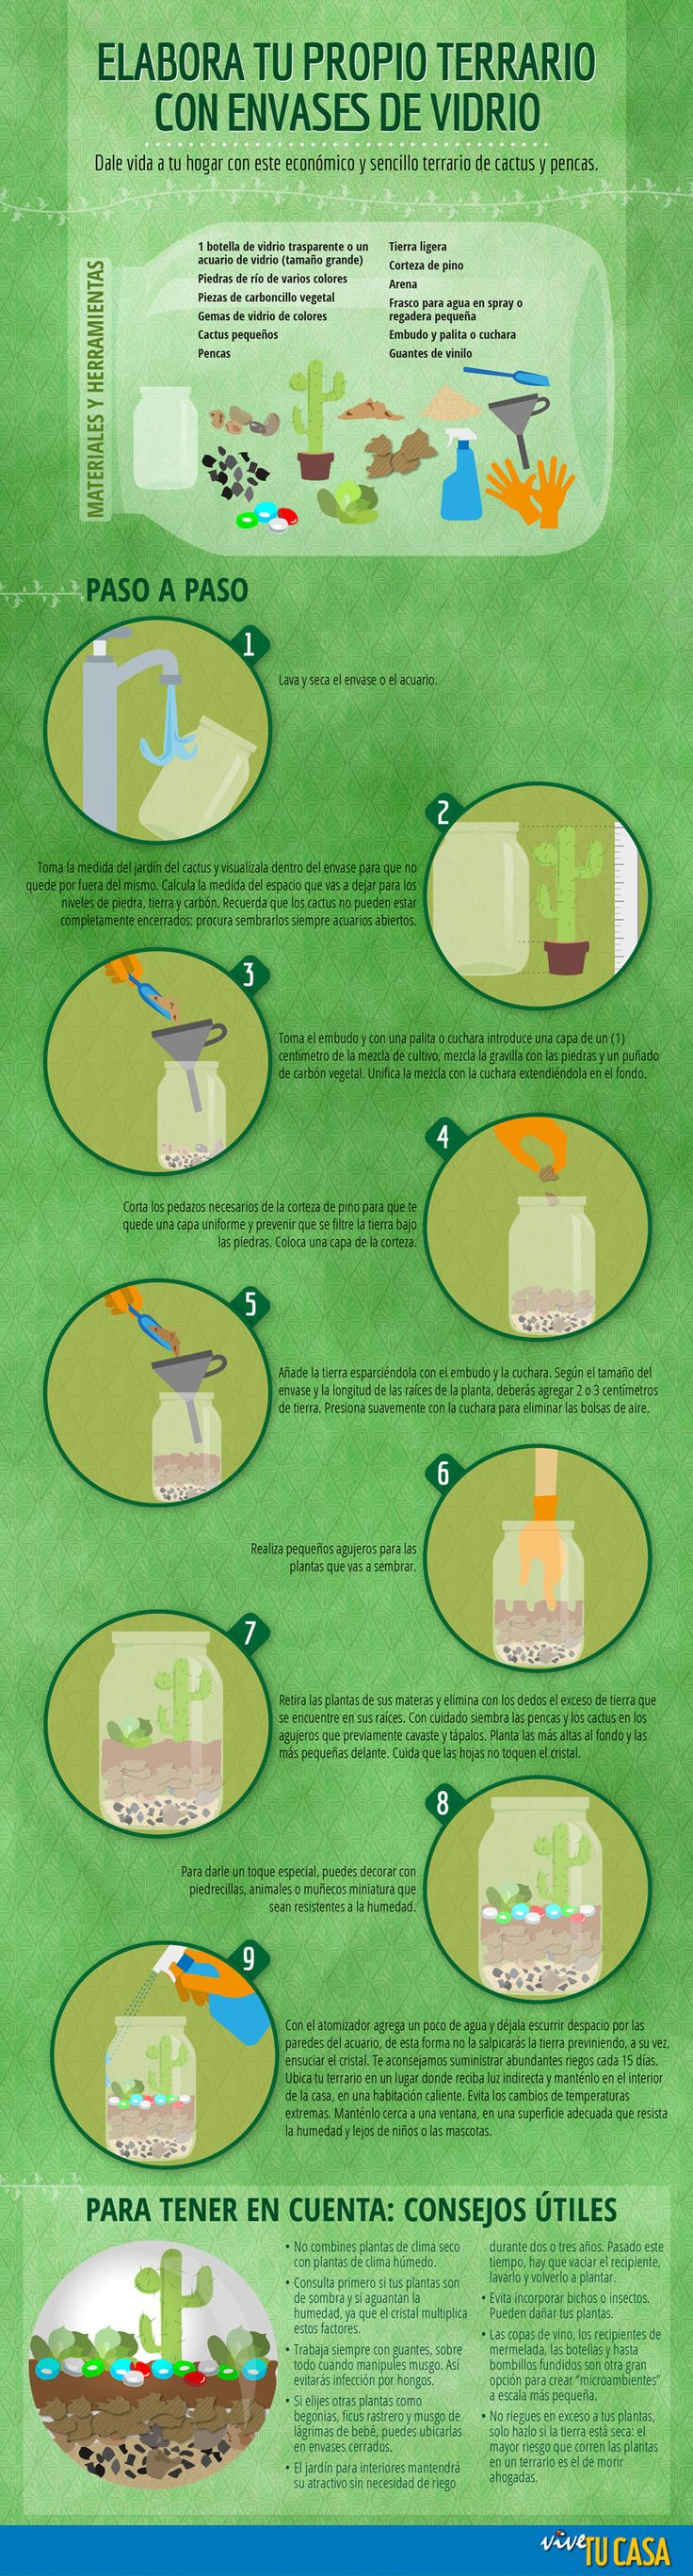 Elabora tu propio terrario con envases de vidrio . Te ayudamos a crear esta…